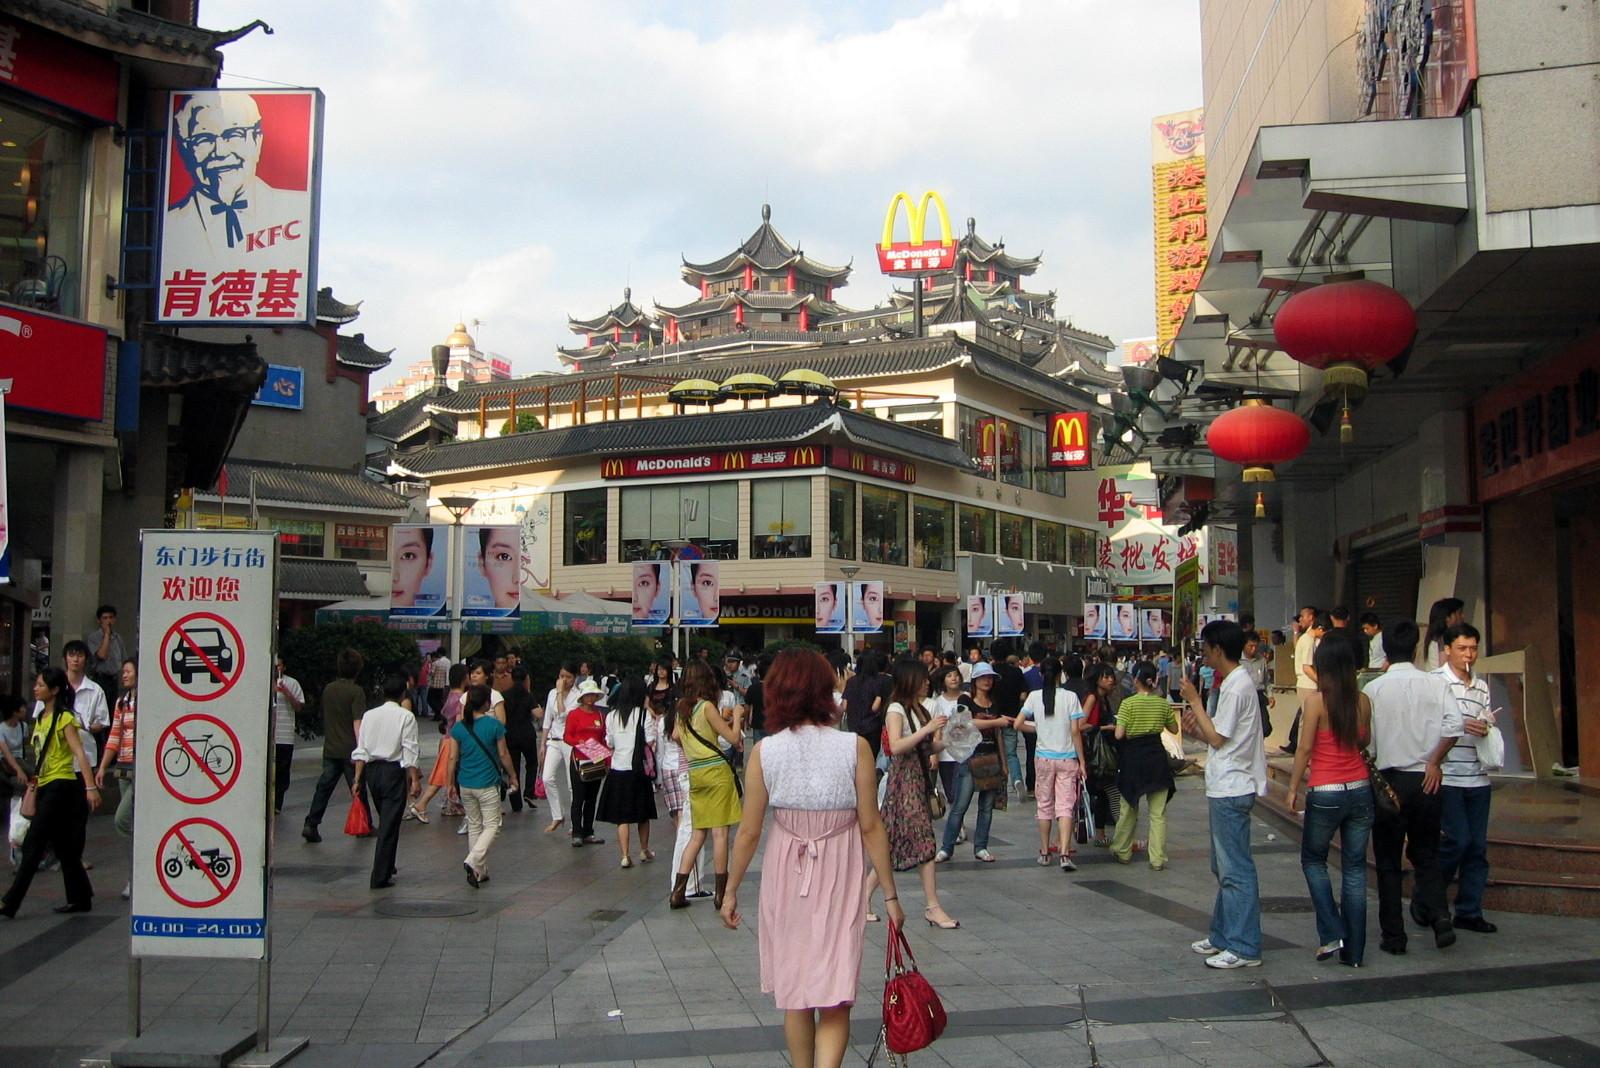 Građani šetaju pešačkom zonom u Šenženu (Foto: Wikimedia)